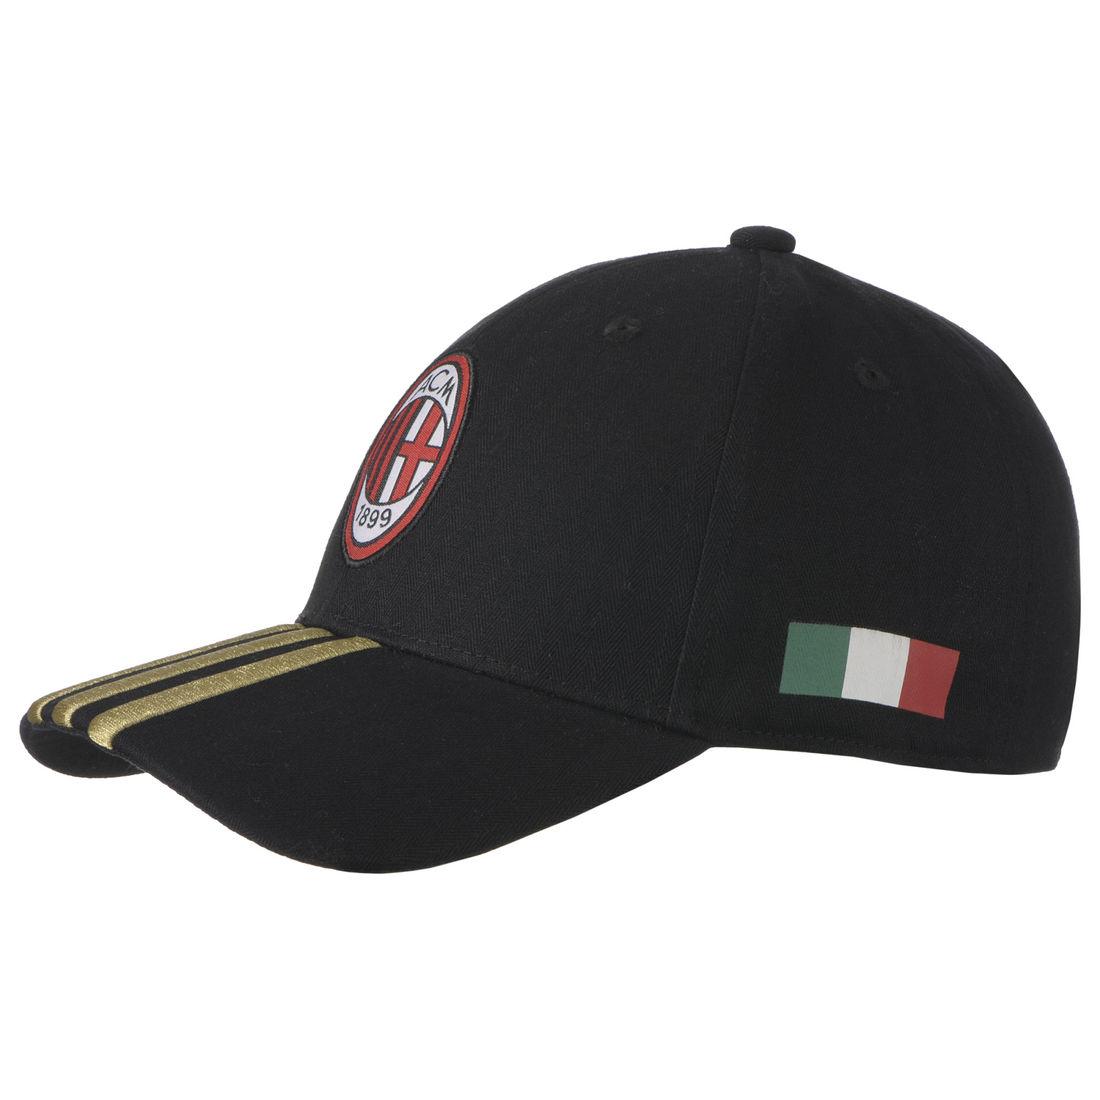 deb0a0256c4ad adidas AC Milan 3 Stripes Cap - Soccer Premier